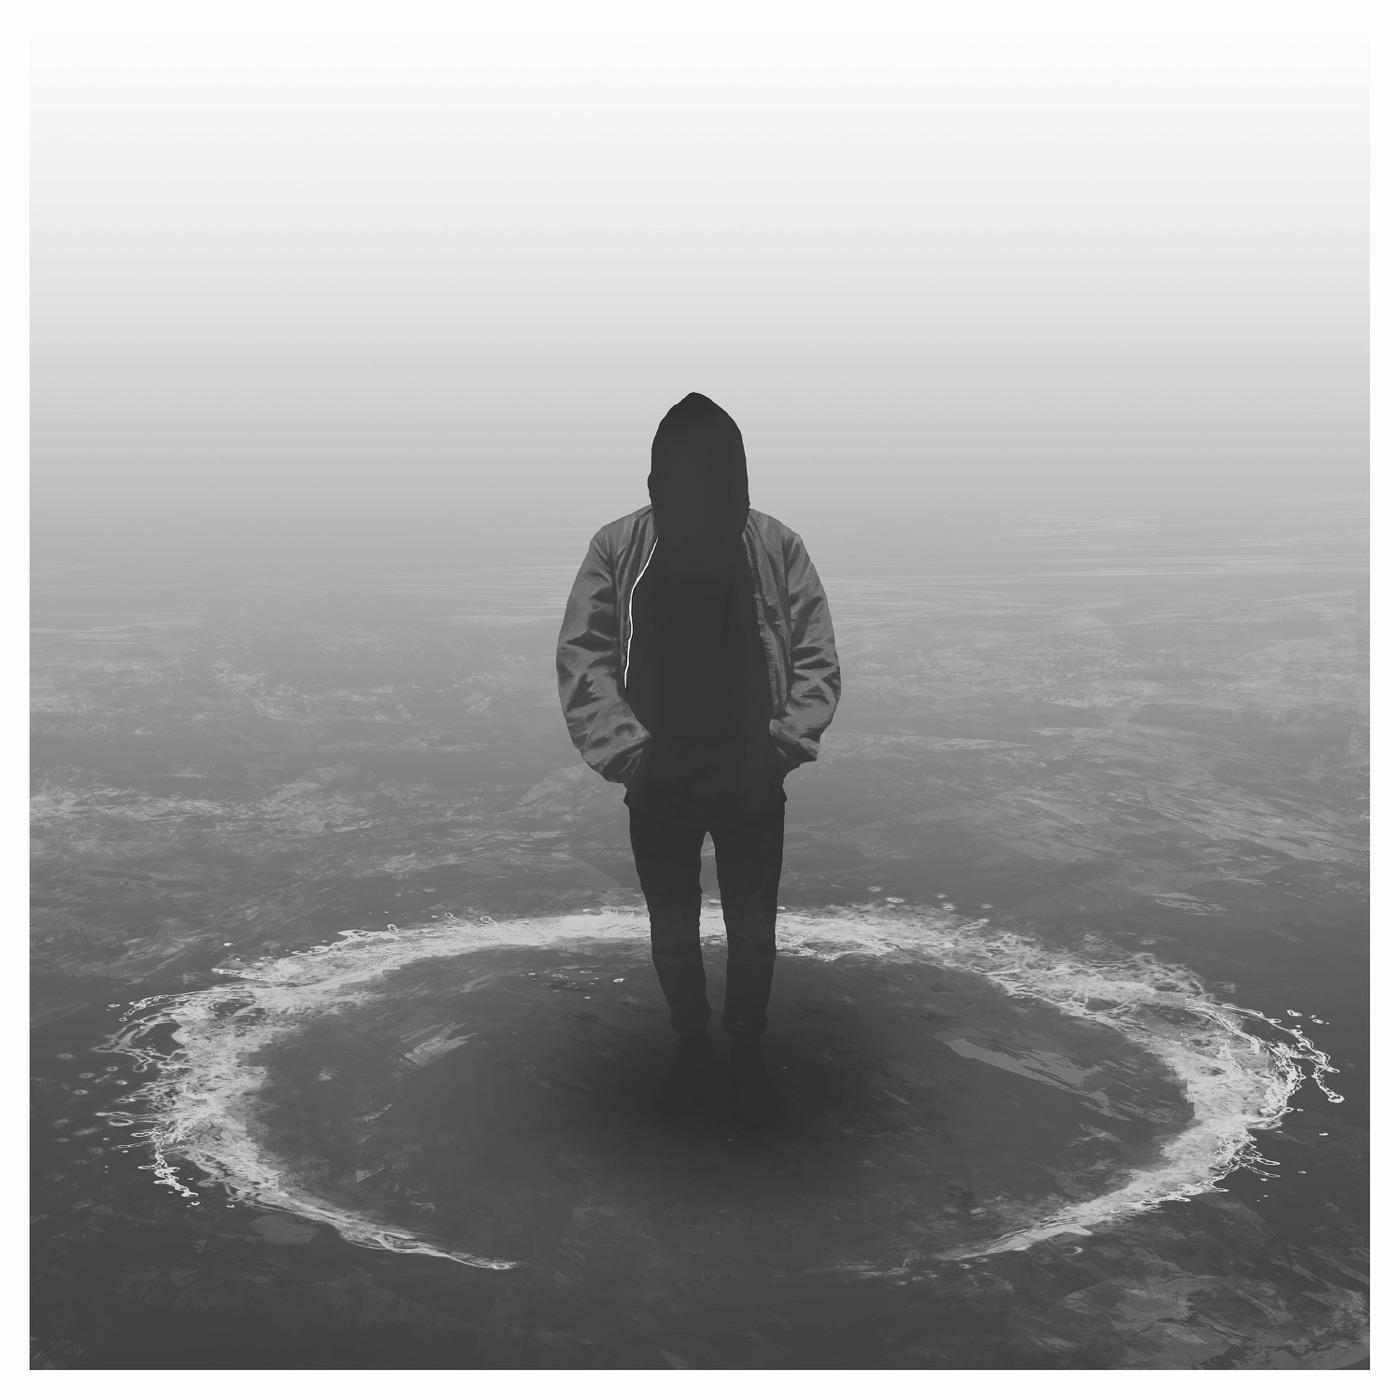 Aspects - Midori [Single] (2018)